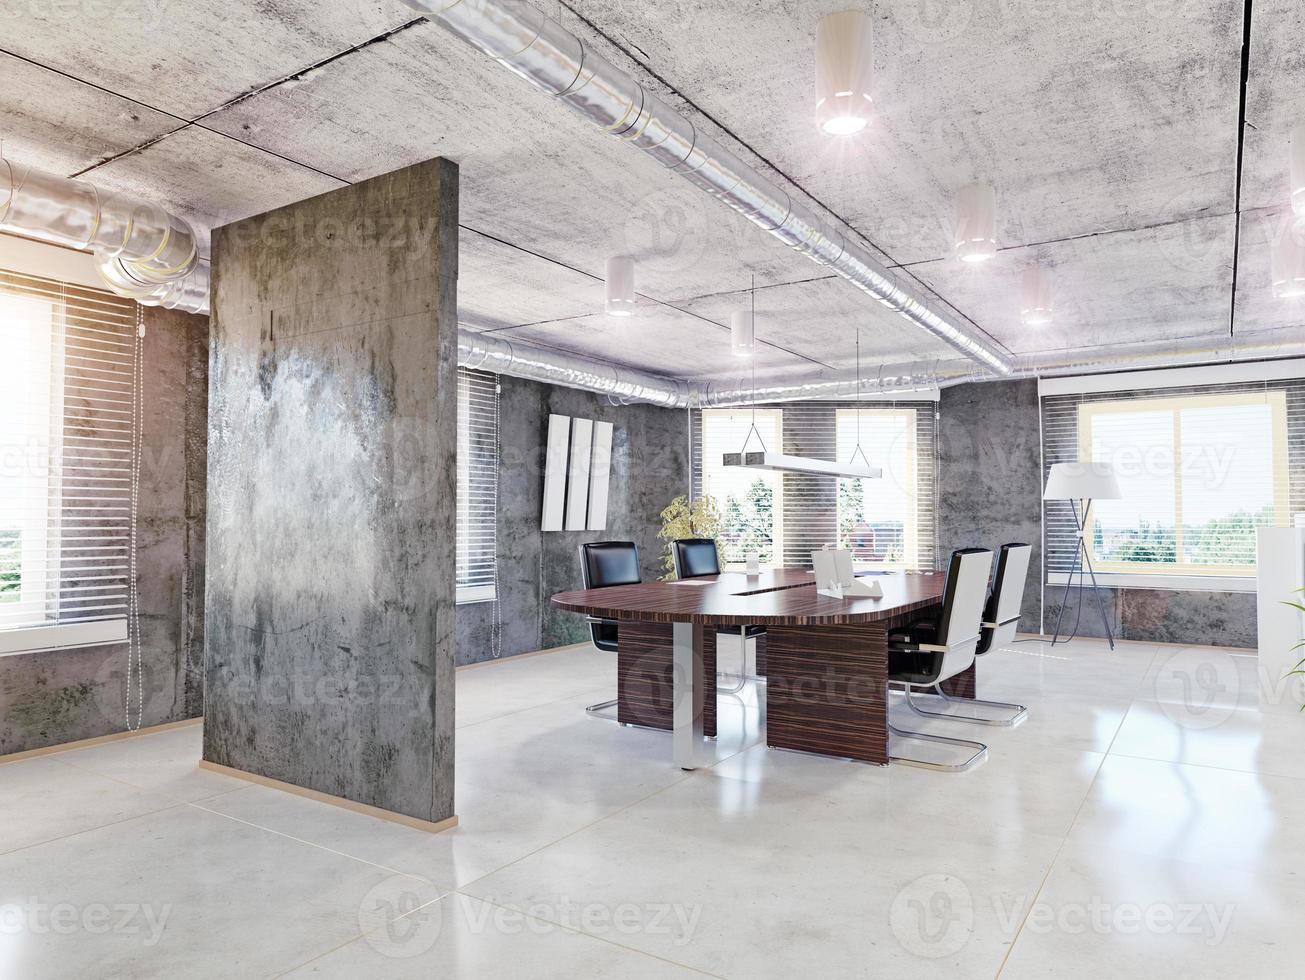 kantoor interieur. foto